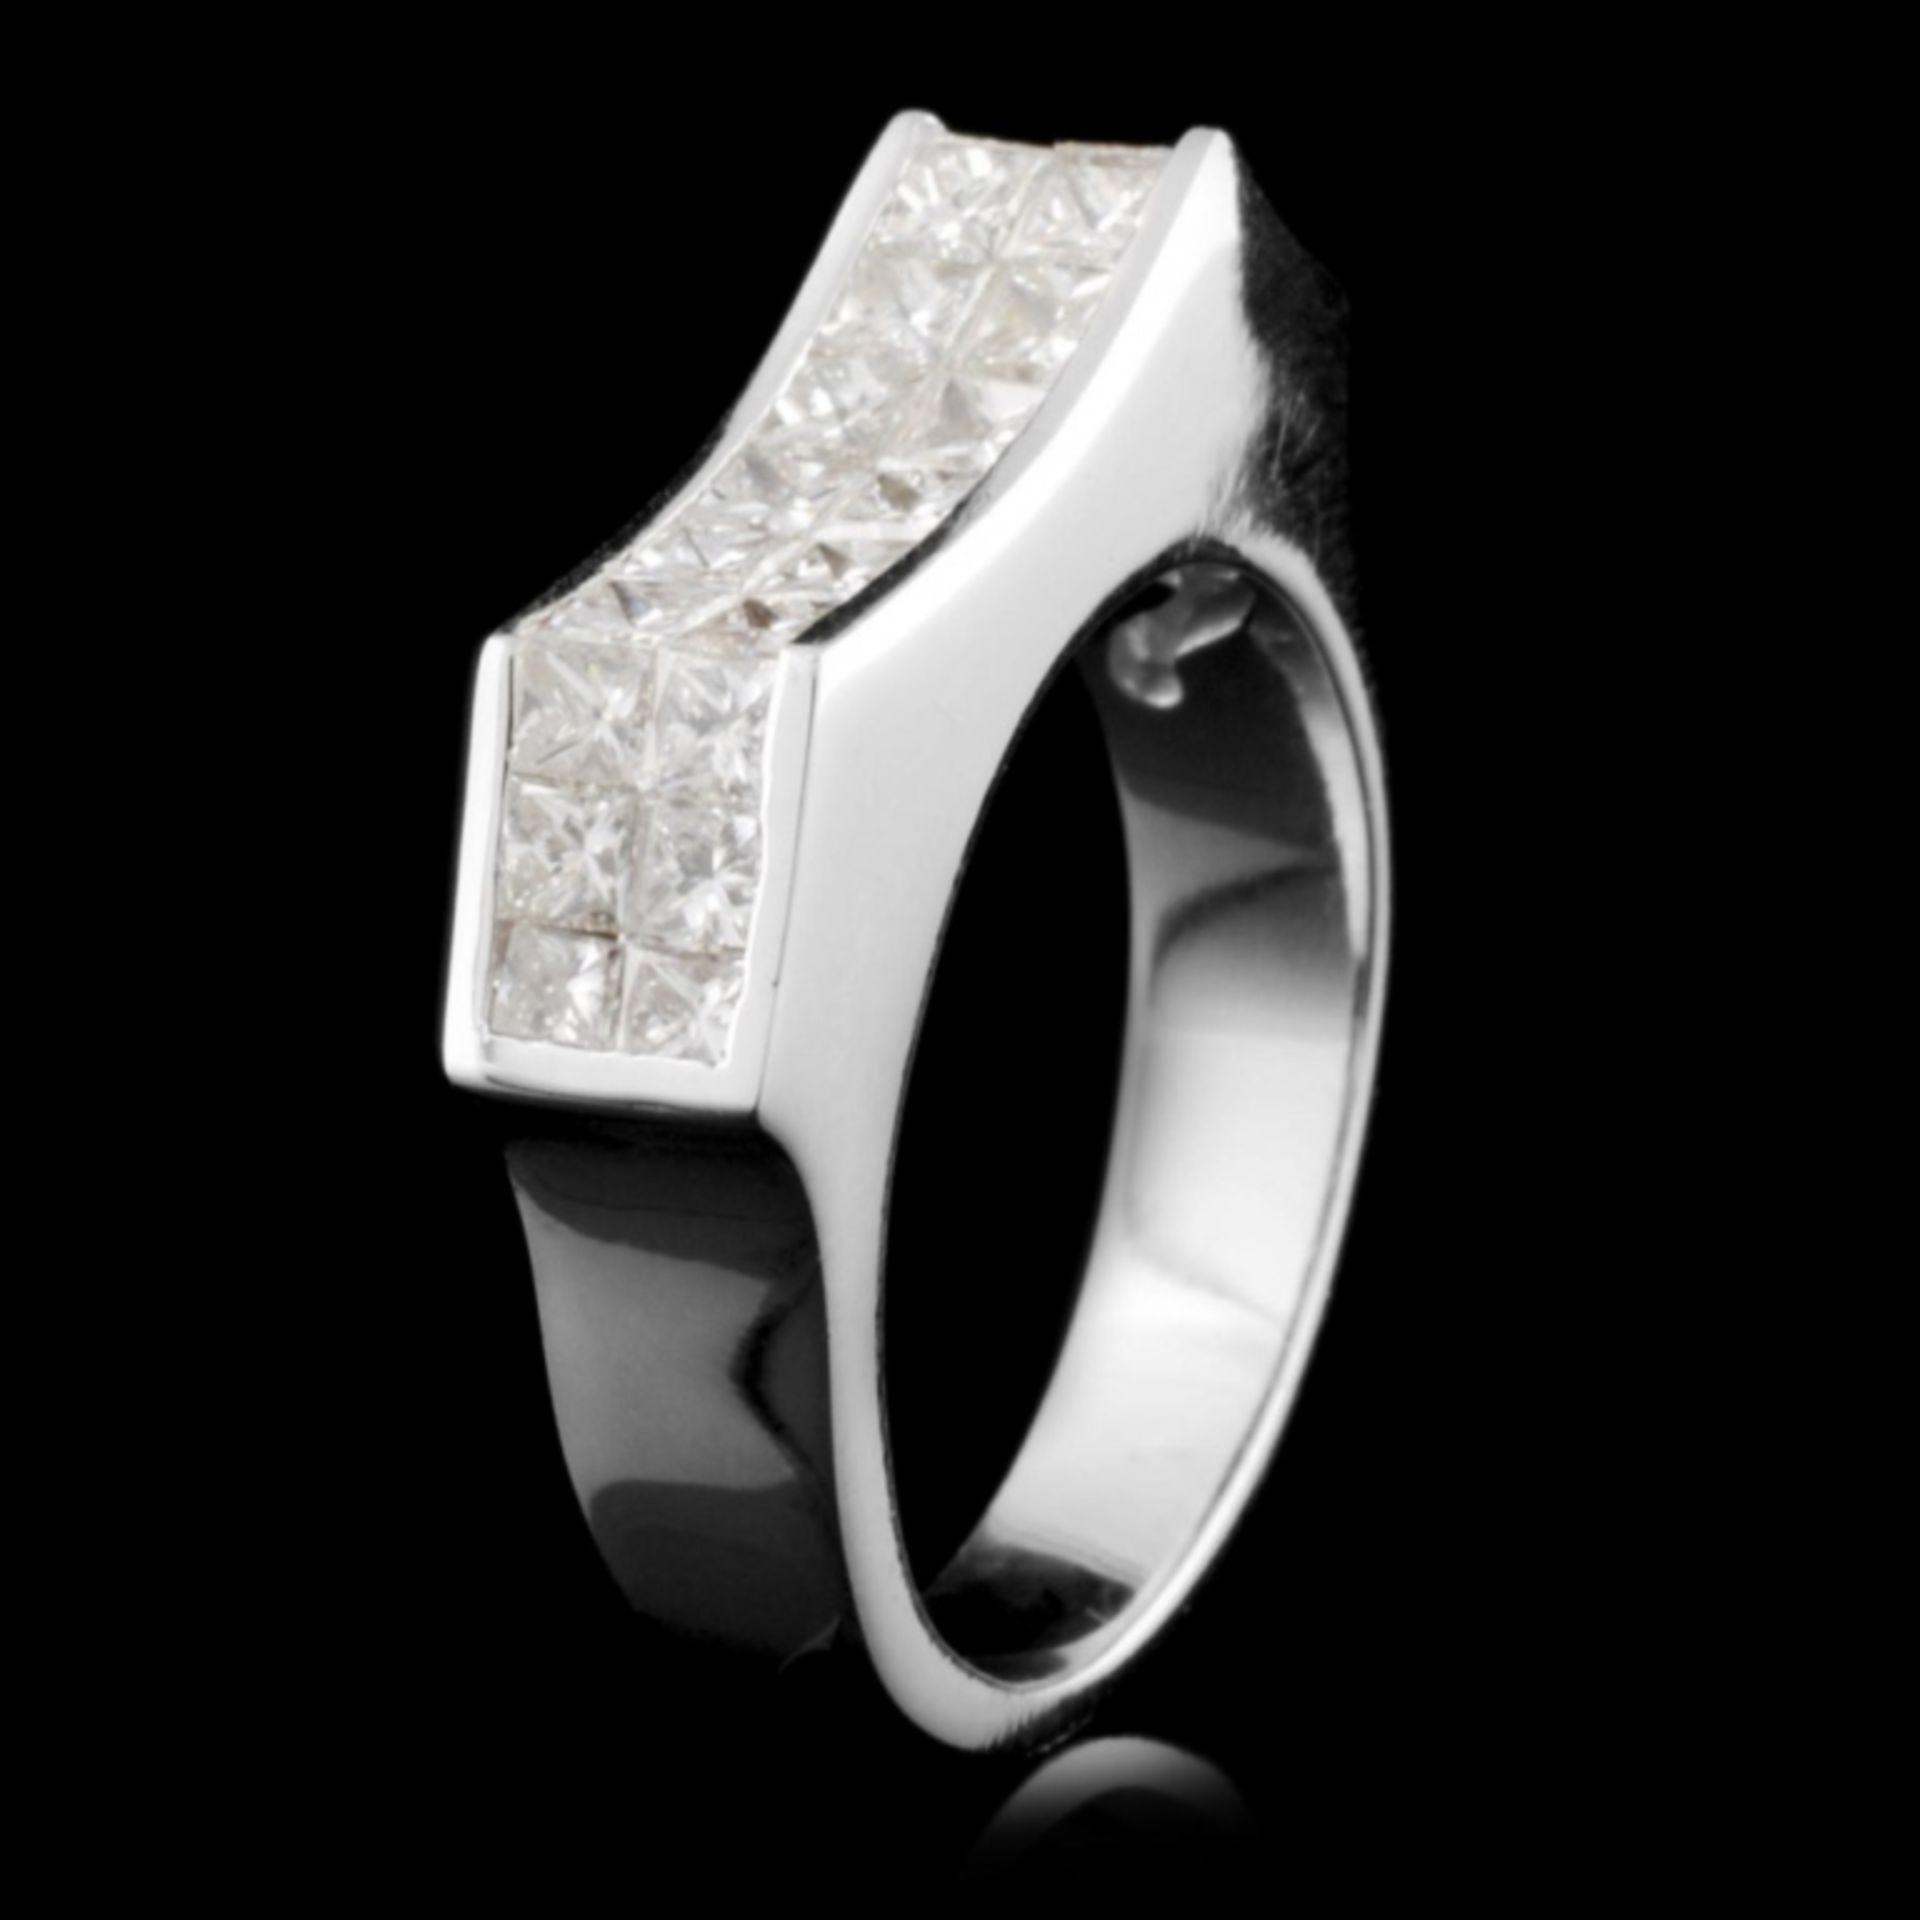 18K Gold 1.92ctw Diamond Ring - Image 2 of 3